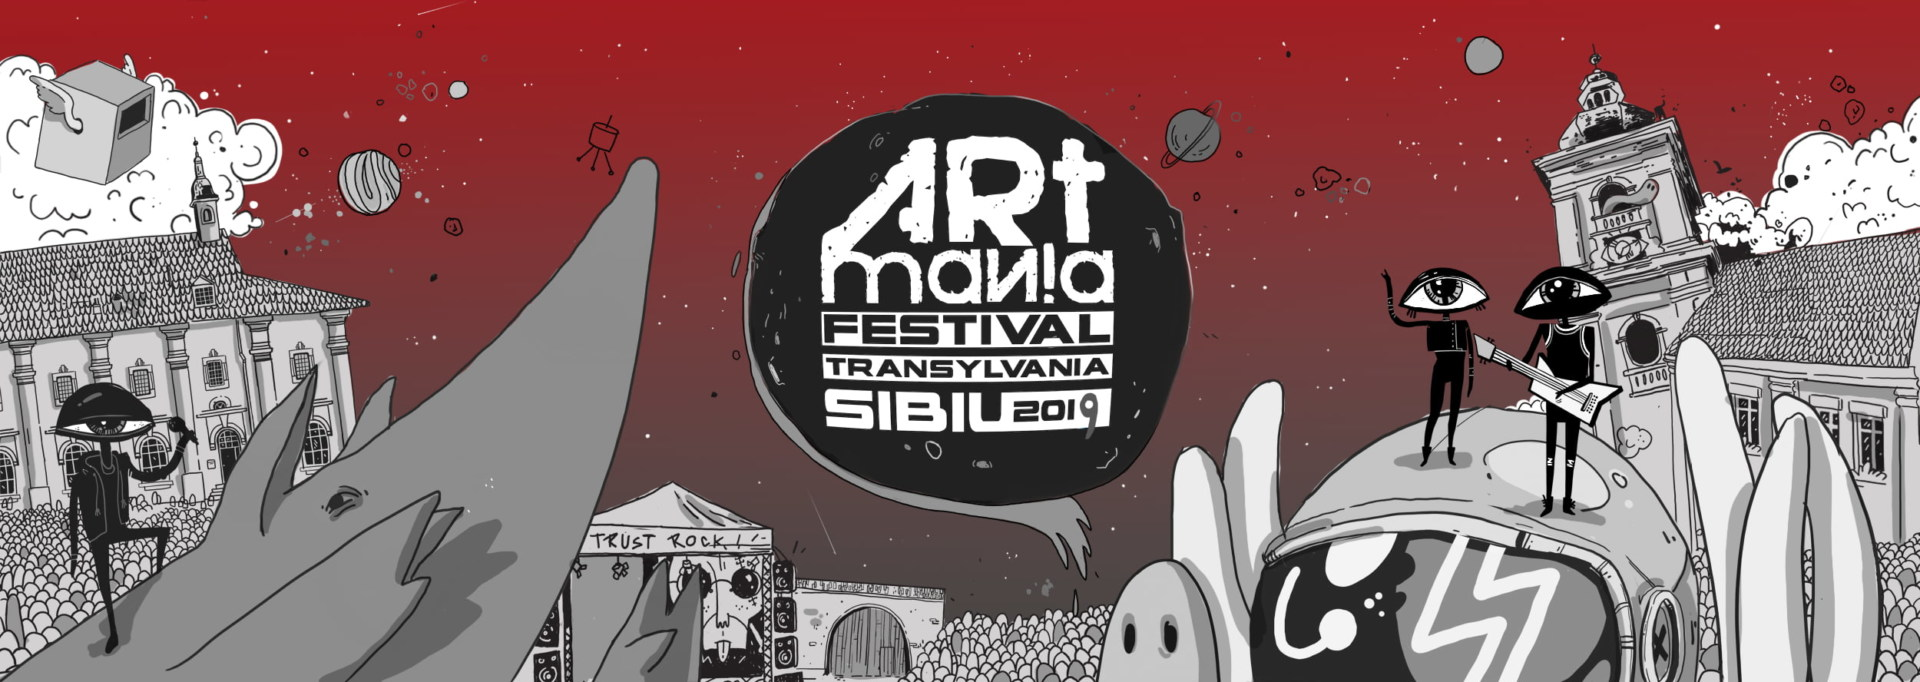 Noutati in line-up si bilete pe zile la ARTmania Festival 2019